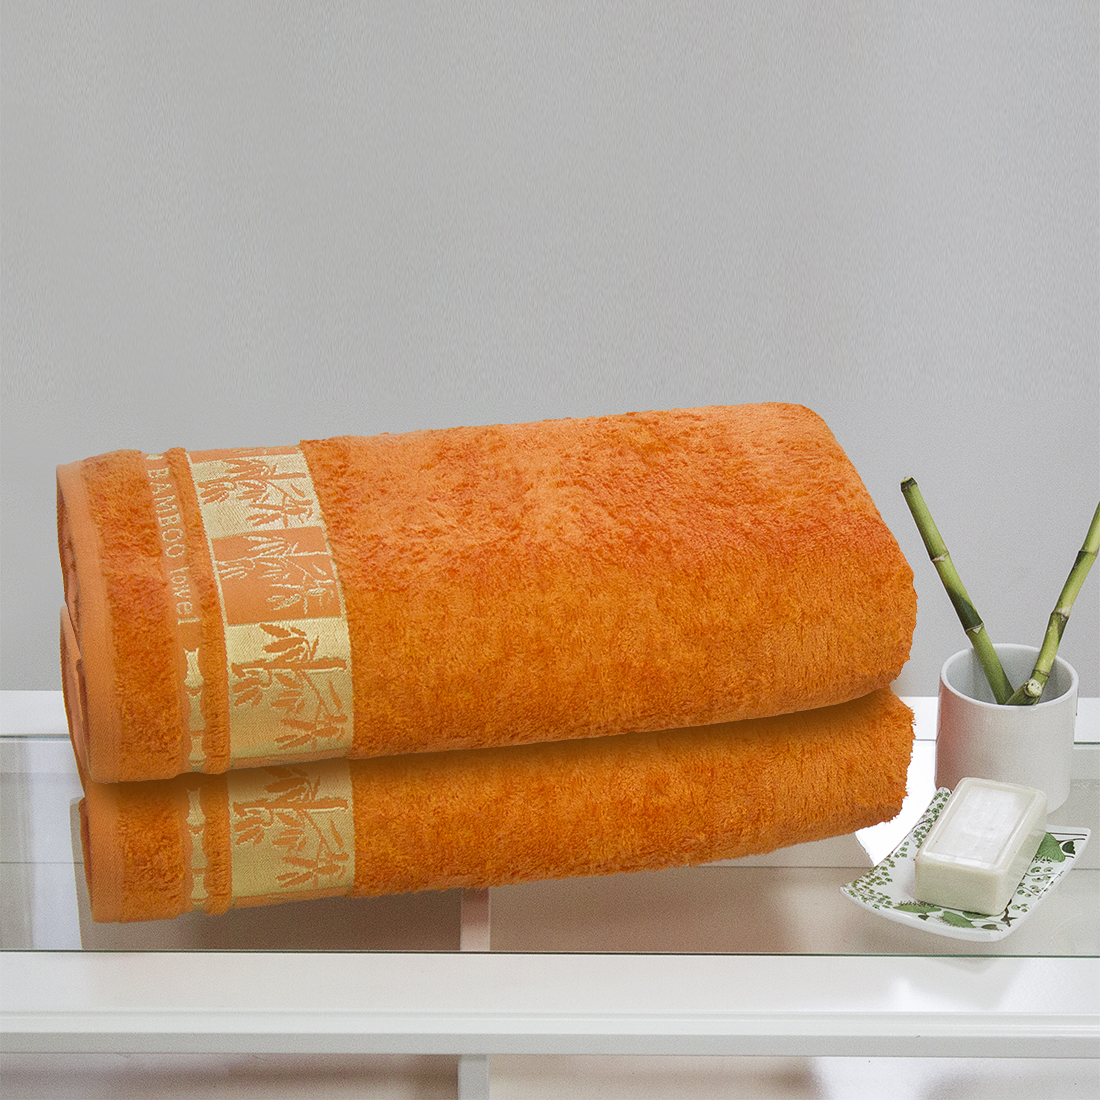 Полотенца Juanna Полотенце Meteor Цвет: Оранжевый (70х140 см - 2 шт) набор из 3 полотенец merzuka sakura 50х90 2 70х140 8432 оранжевый